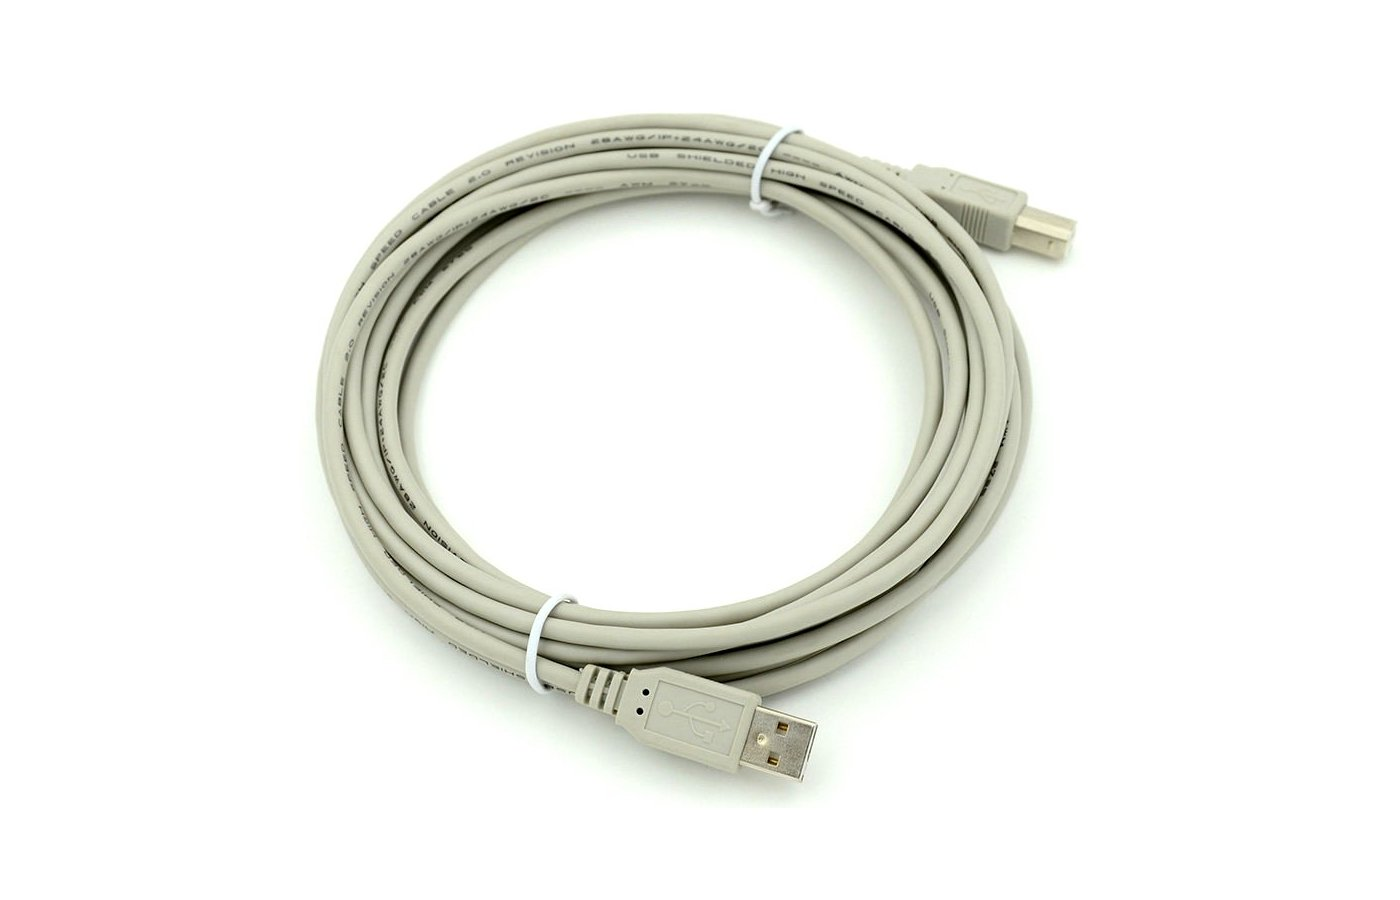 USB Кабель Кабель USB 2.0 A(m) - B(m) 5м (78443)